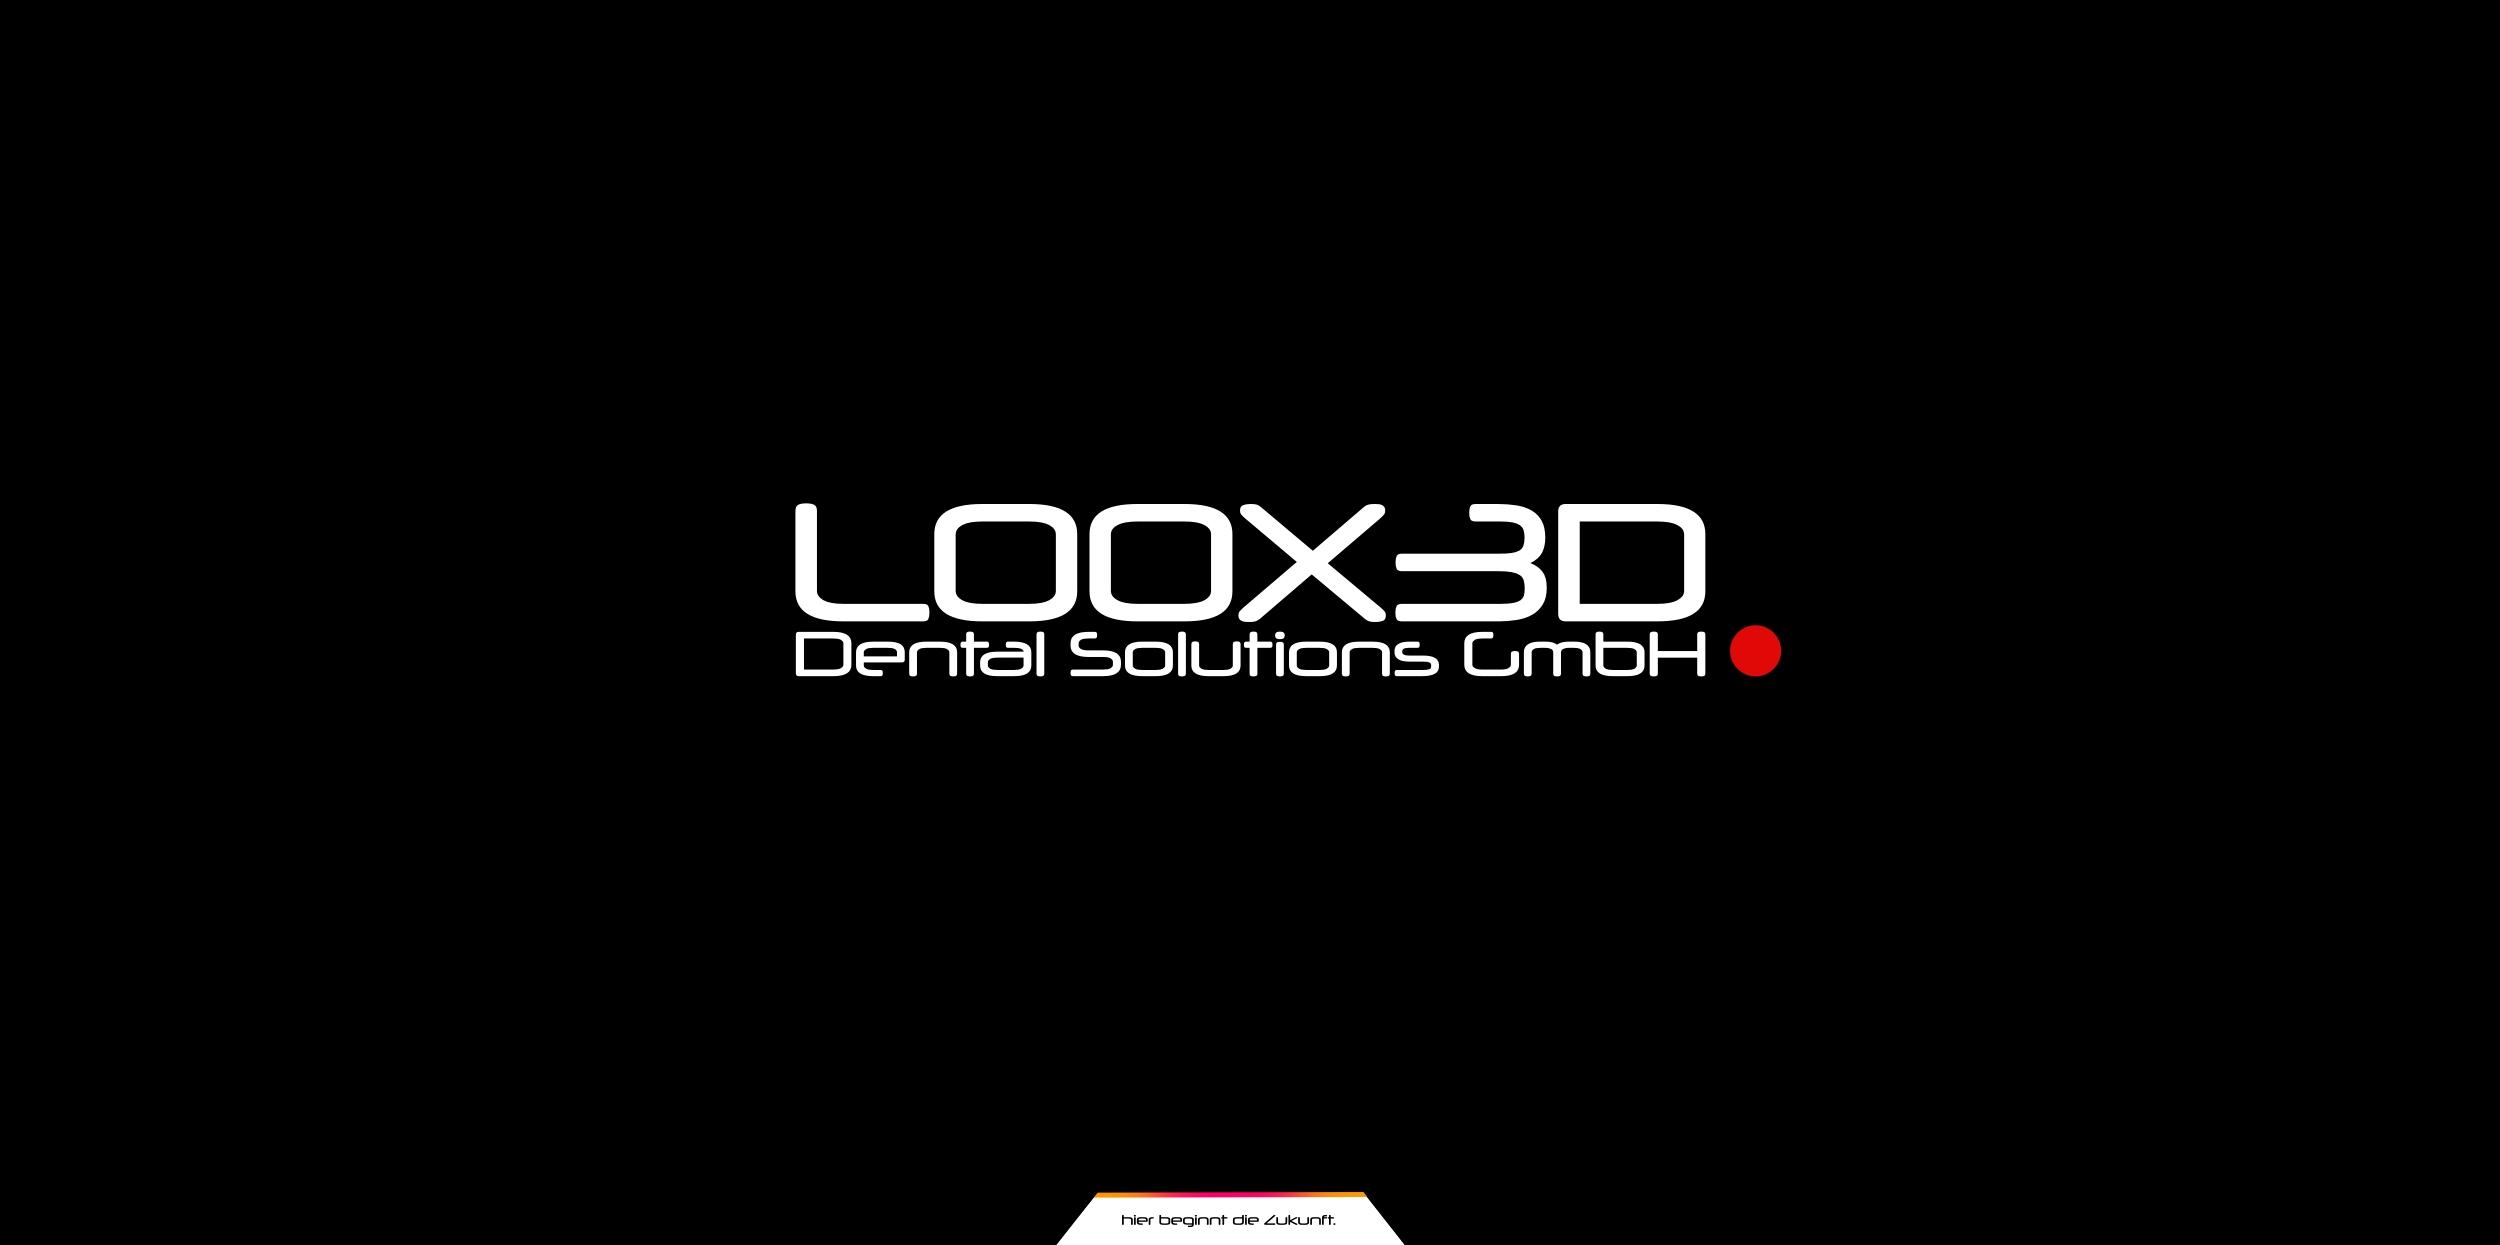 LOOX3D dental Solutions GmbH 2021 Line